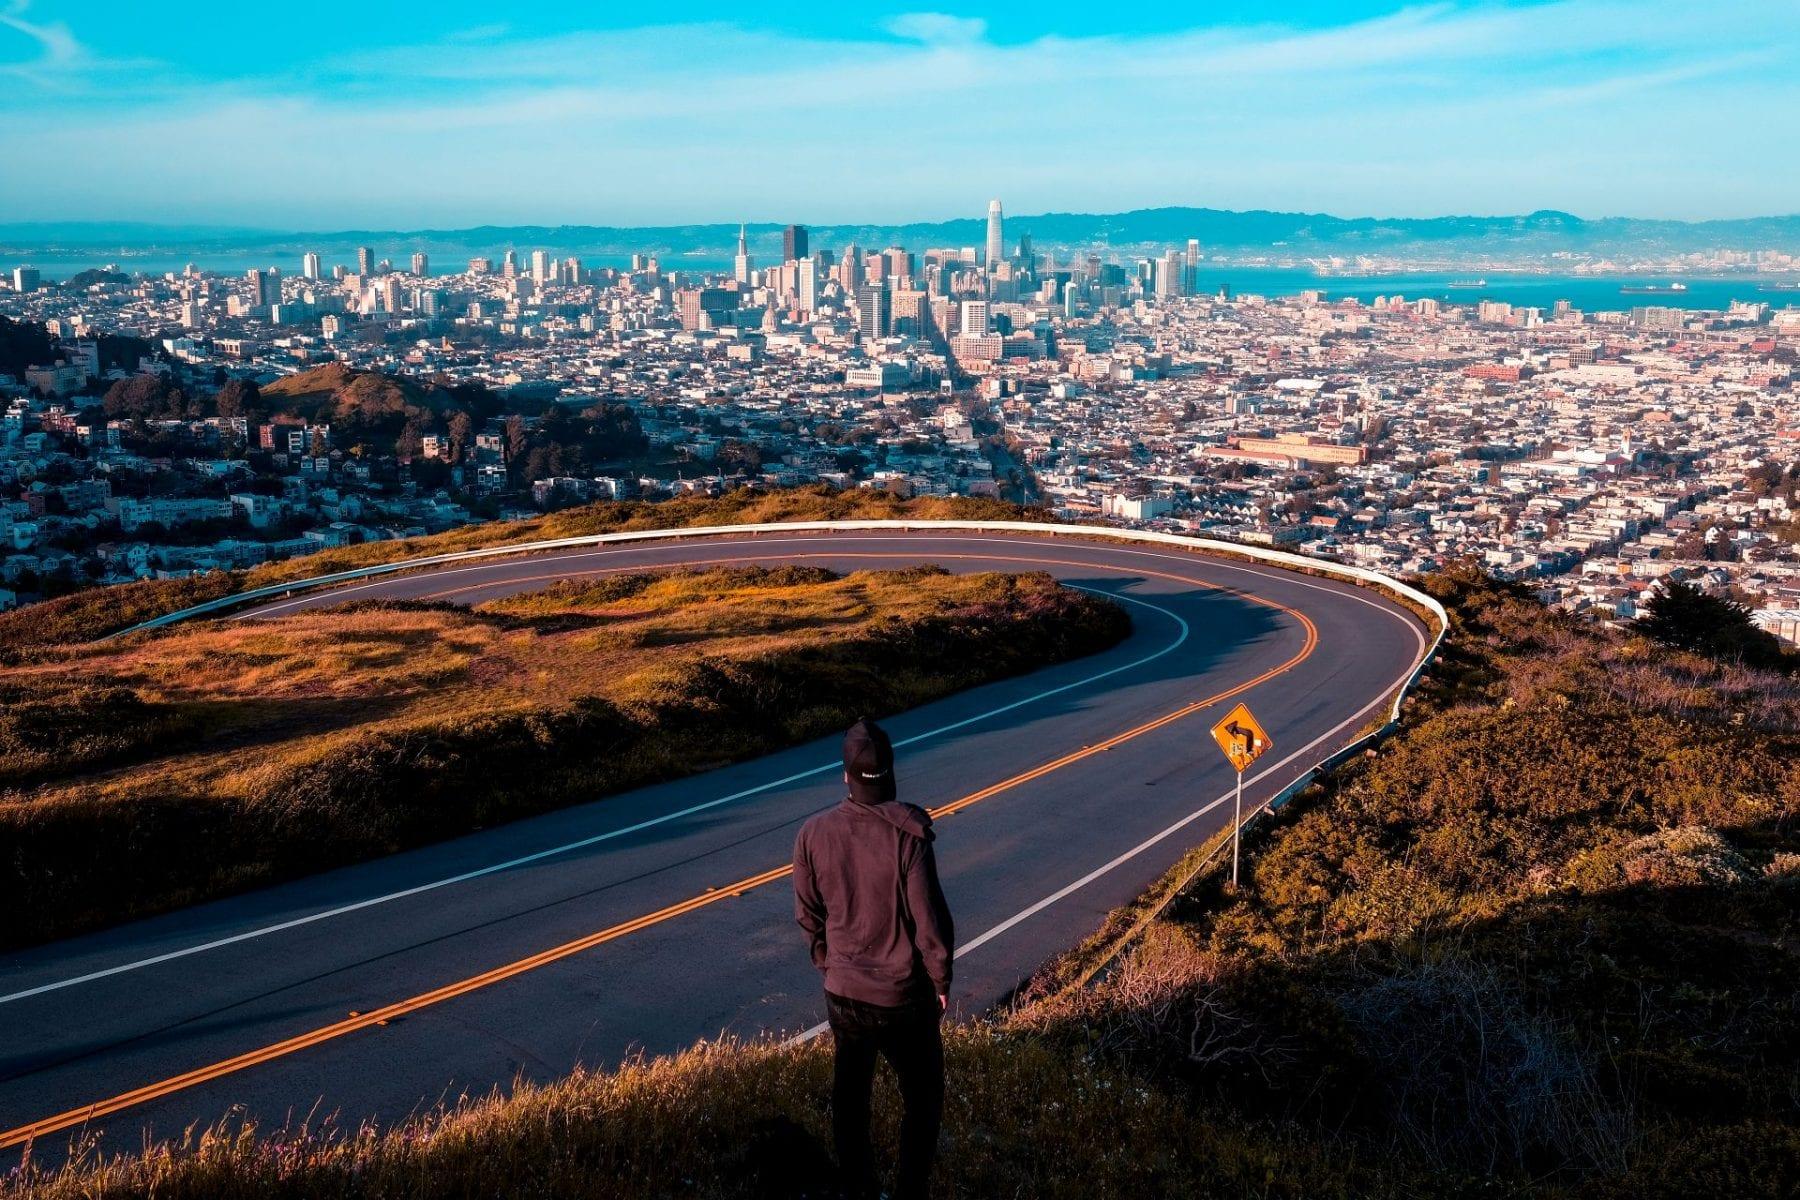 WEB_Road-city views